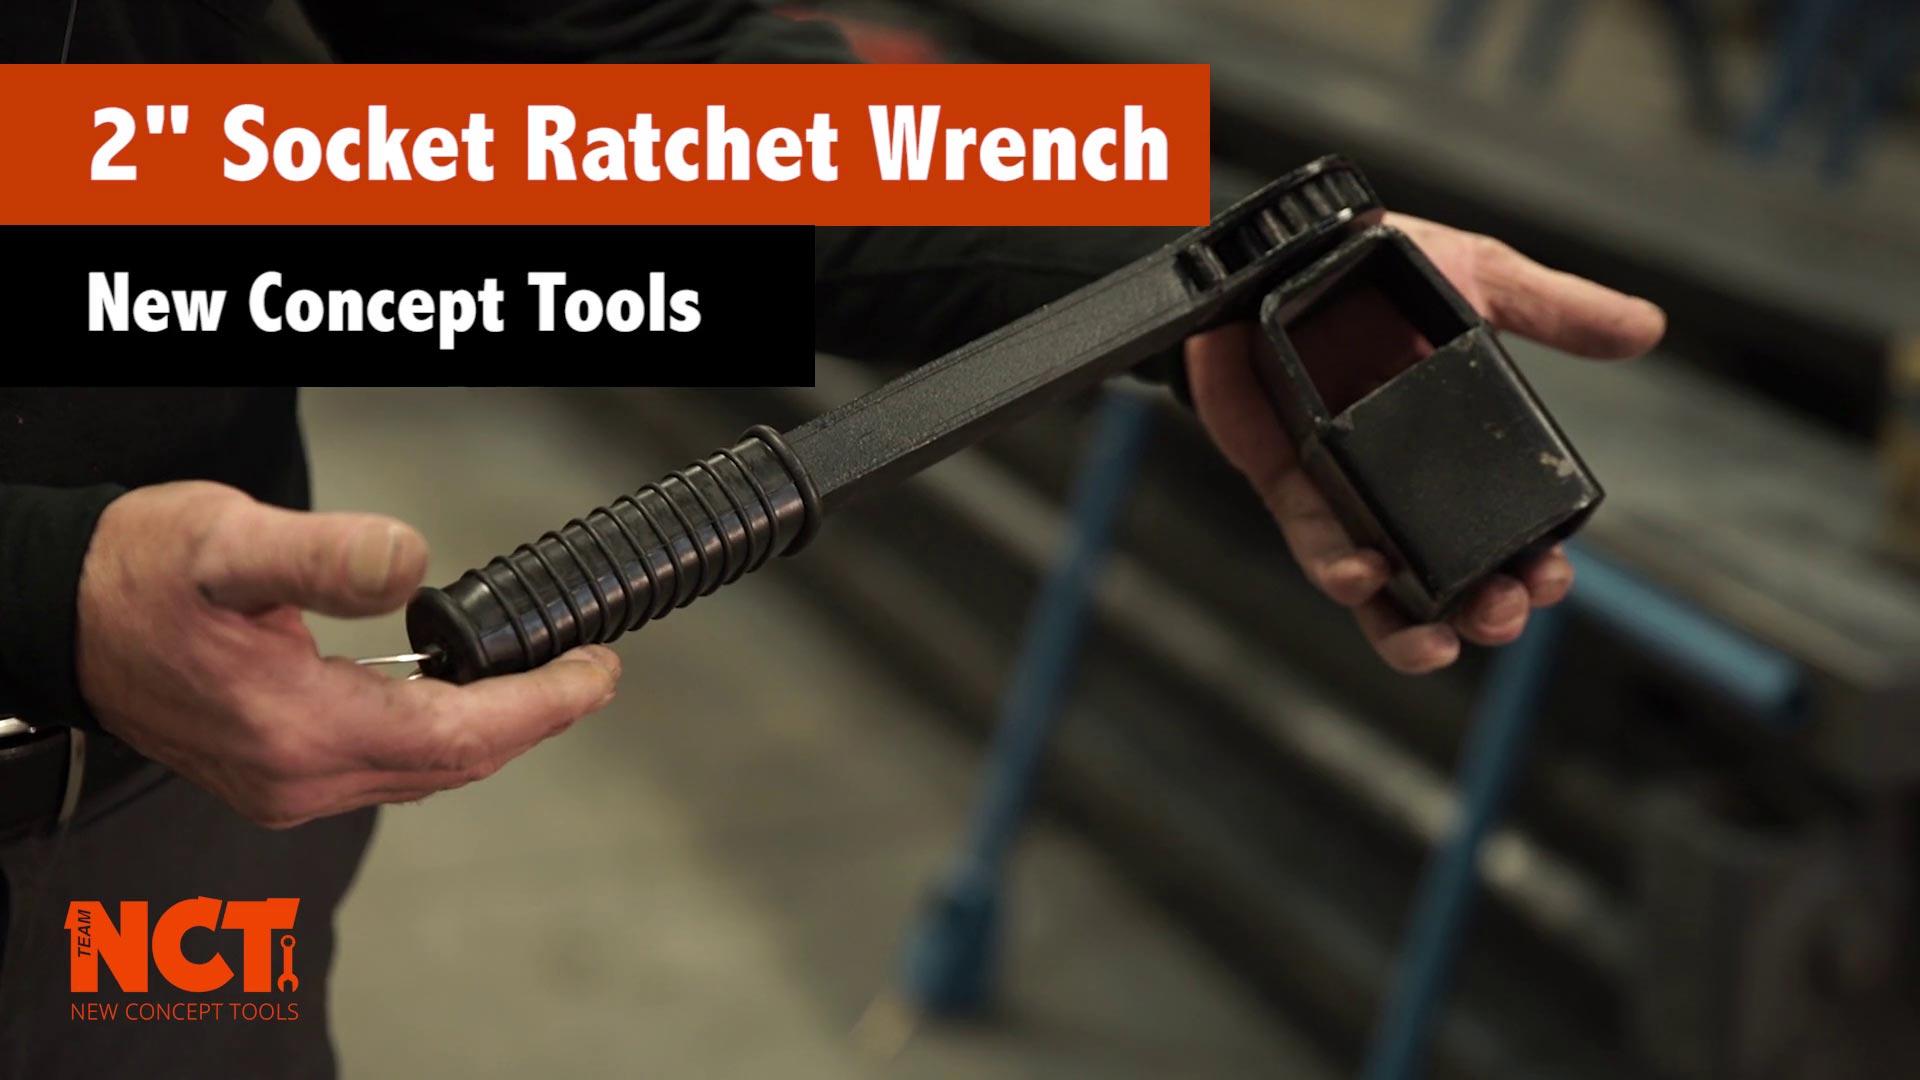 Socket Ratchet Wrench